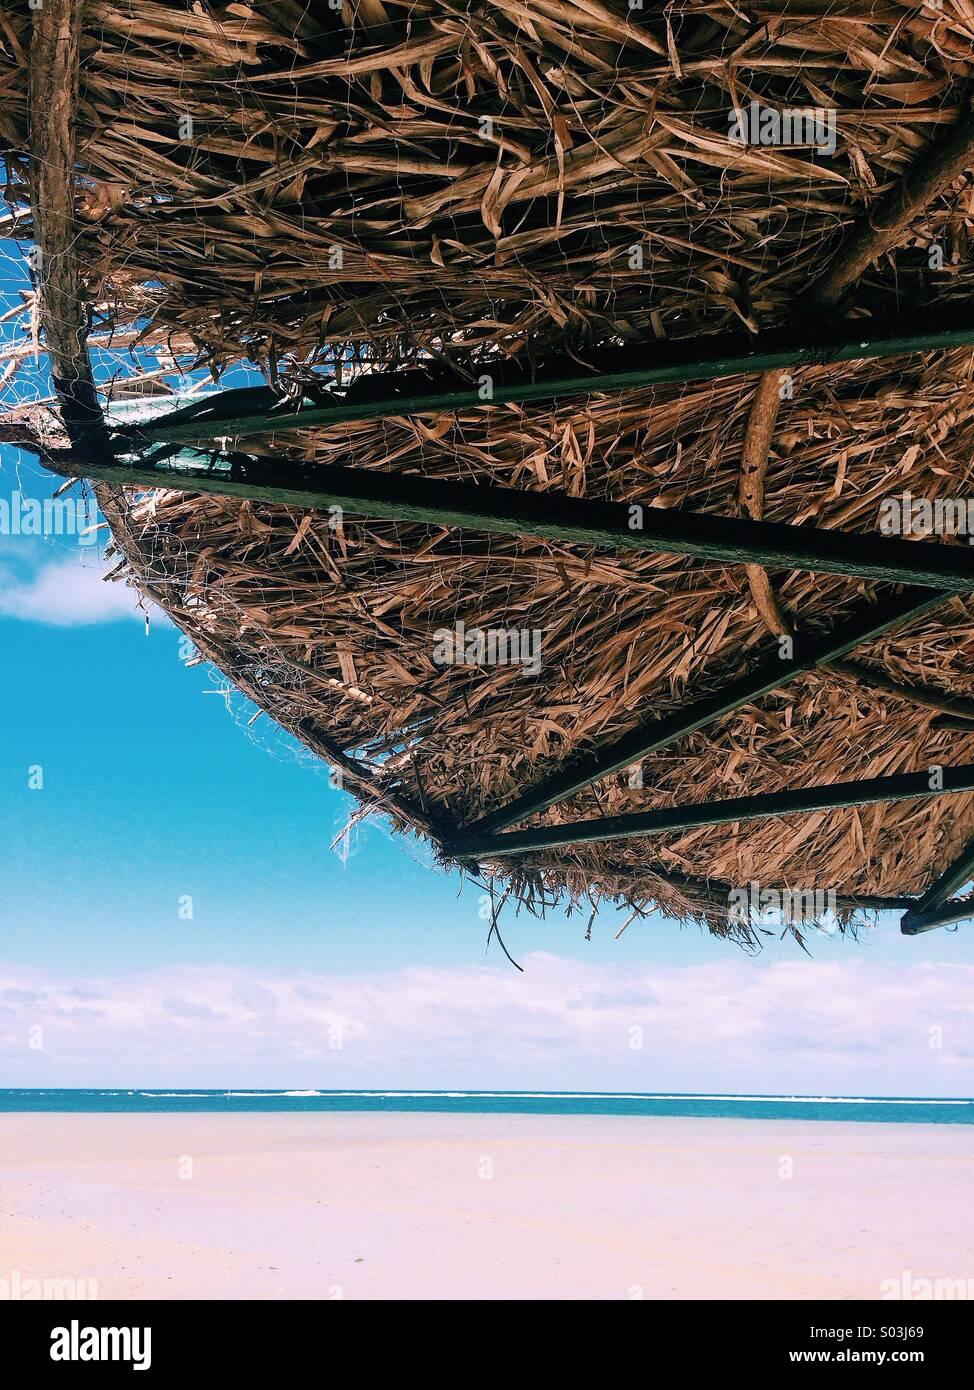 Under a straw beach umbrella on the beach in Fiji - Stock Image